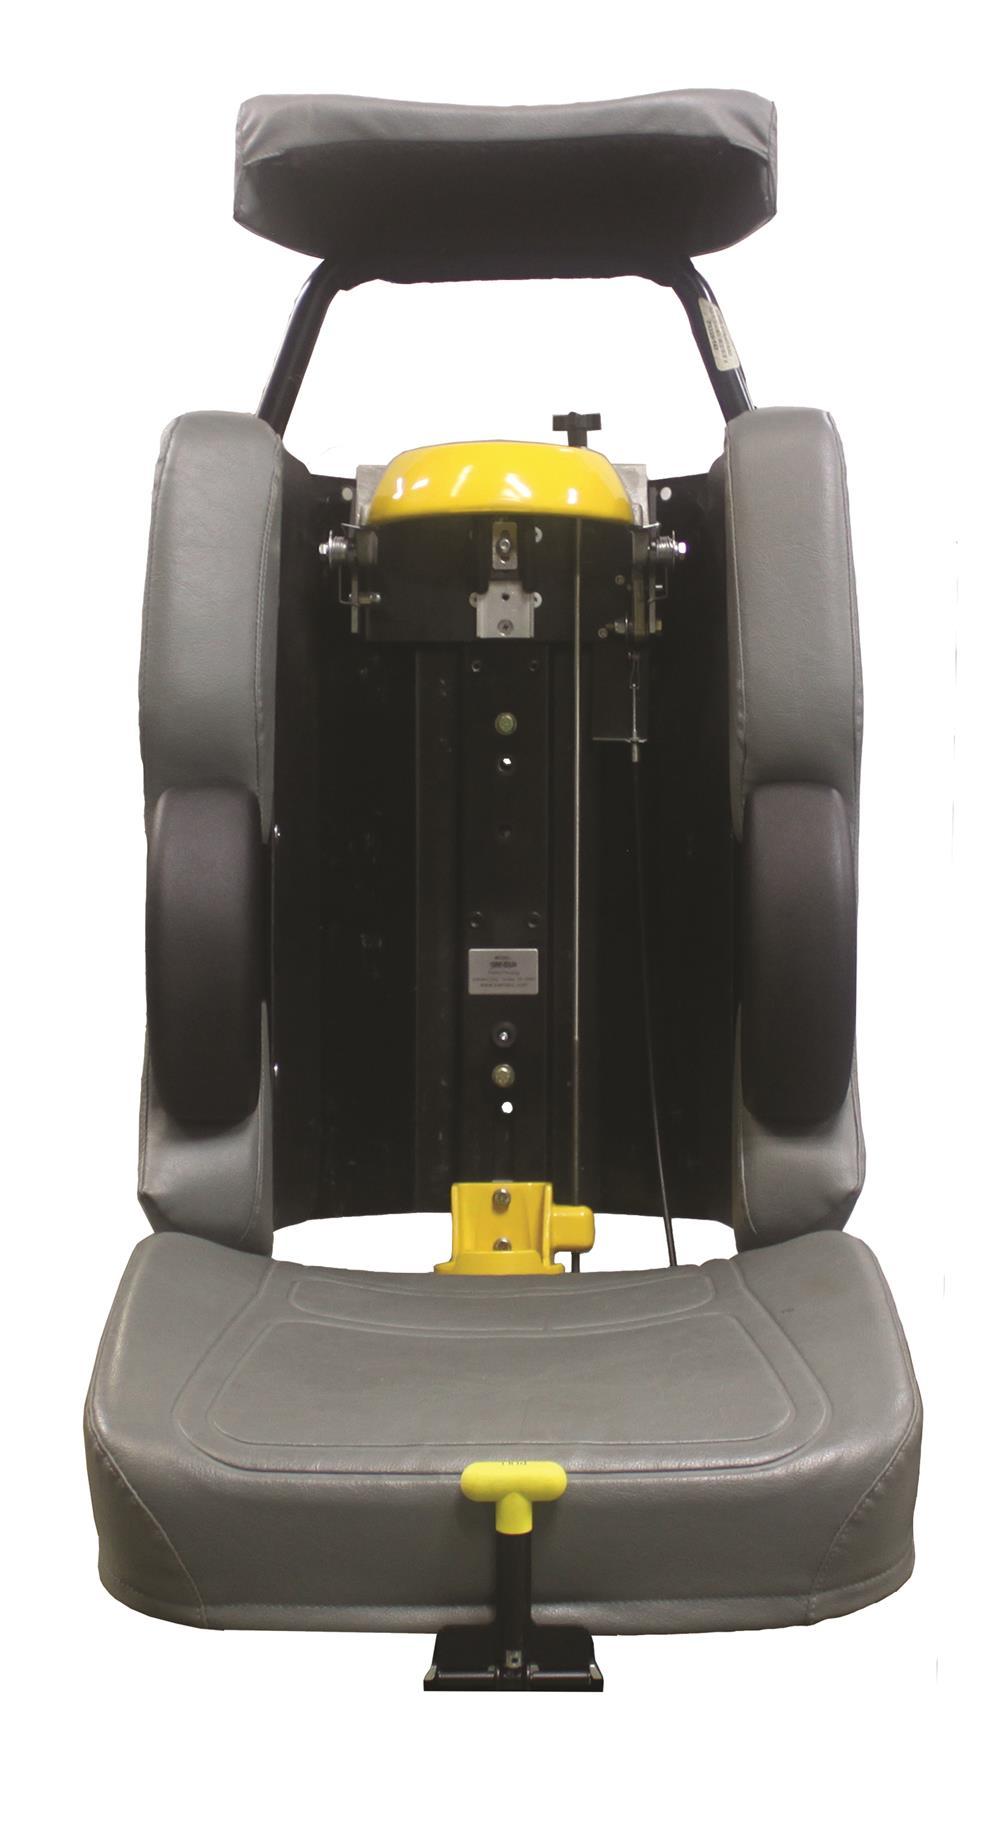 EZ-LOC Center Pull Release – Bostrom 350/450 Tanker Seat